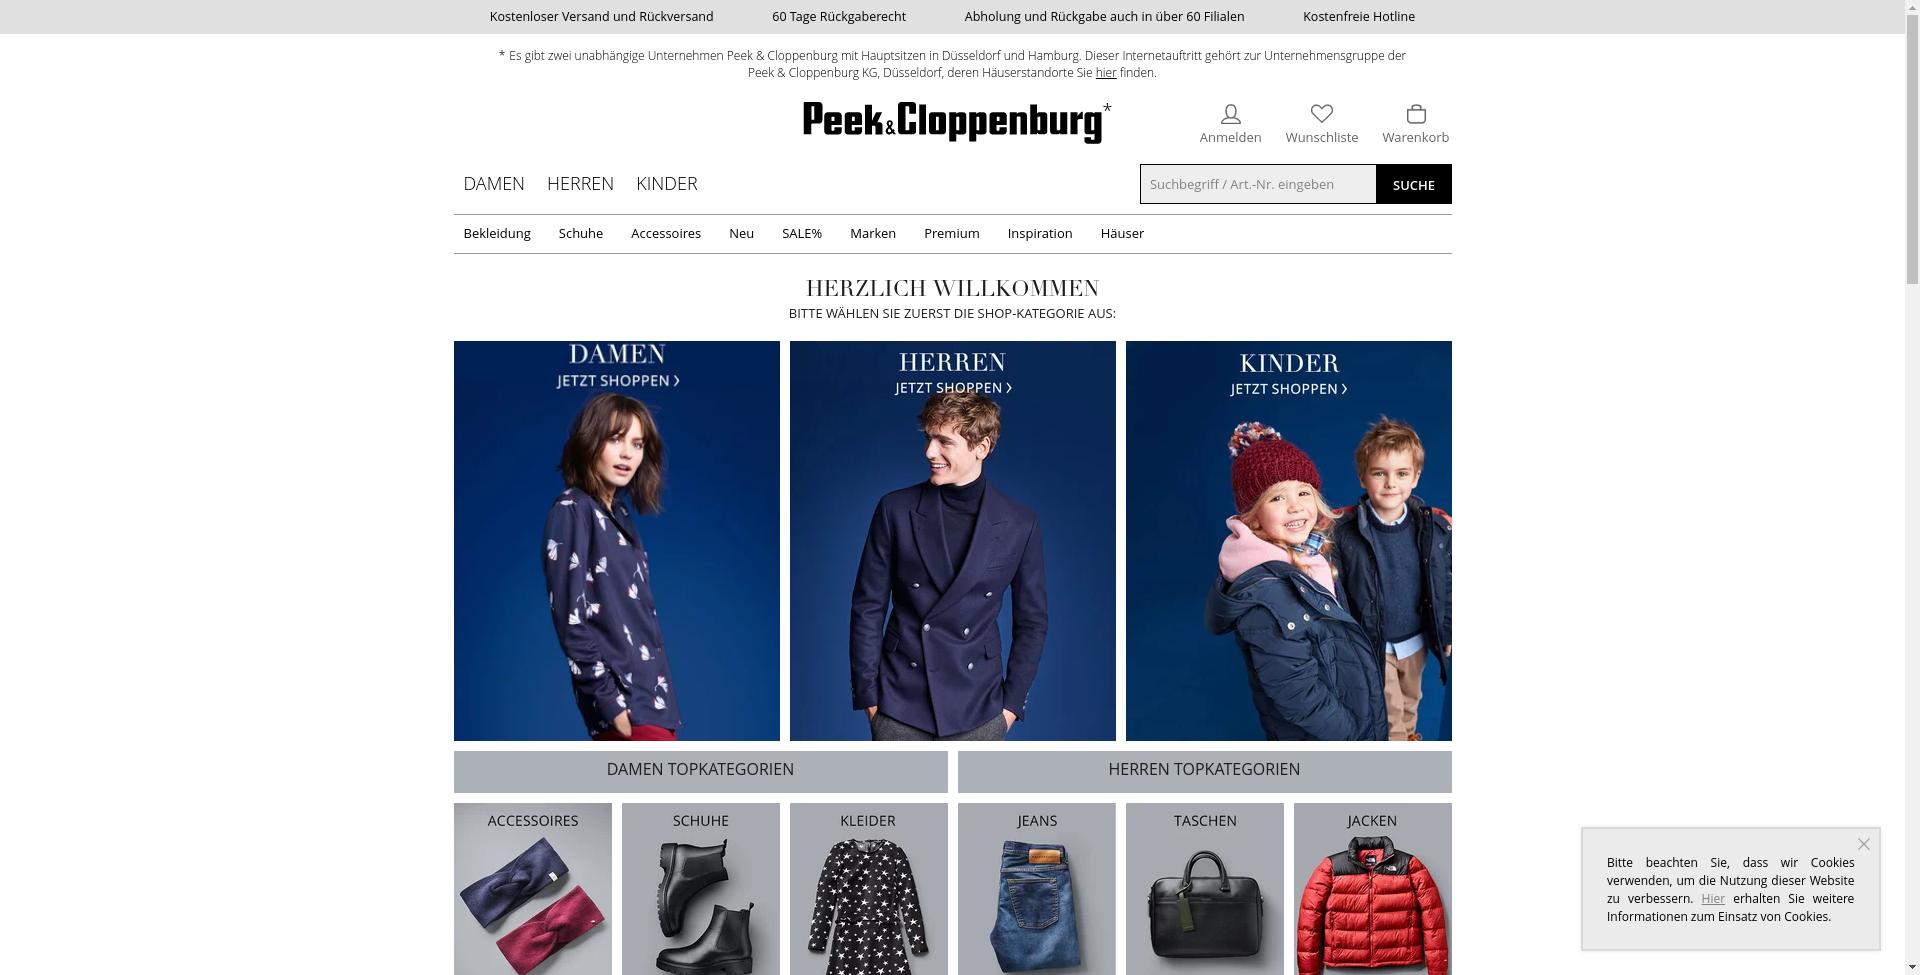 Peek & Cloppenburg*